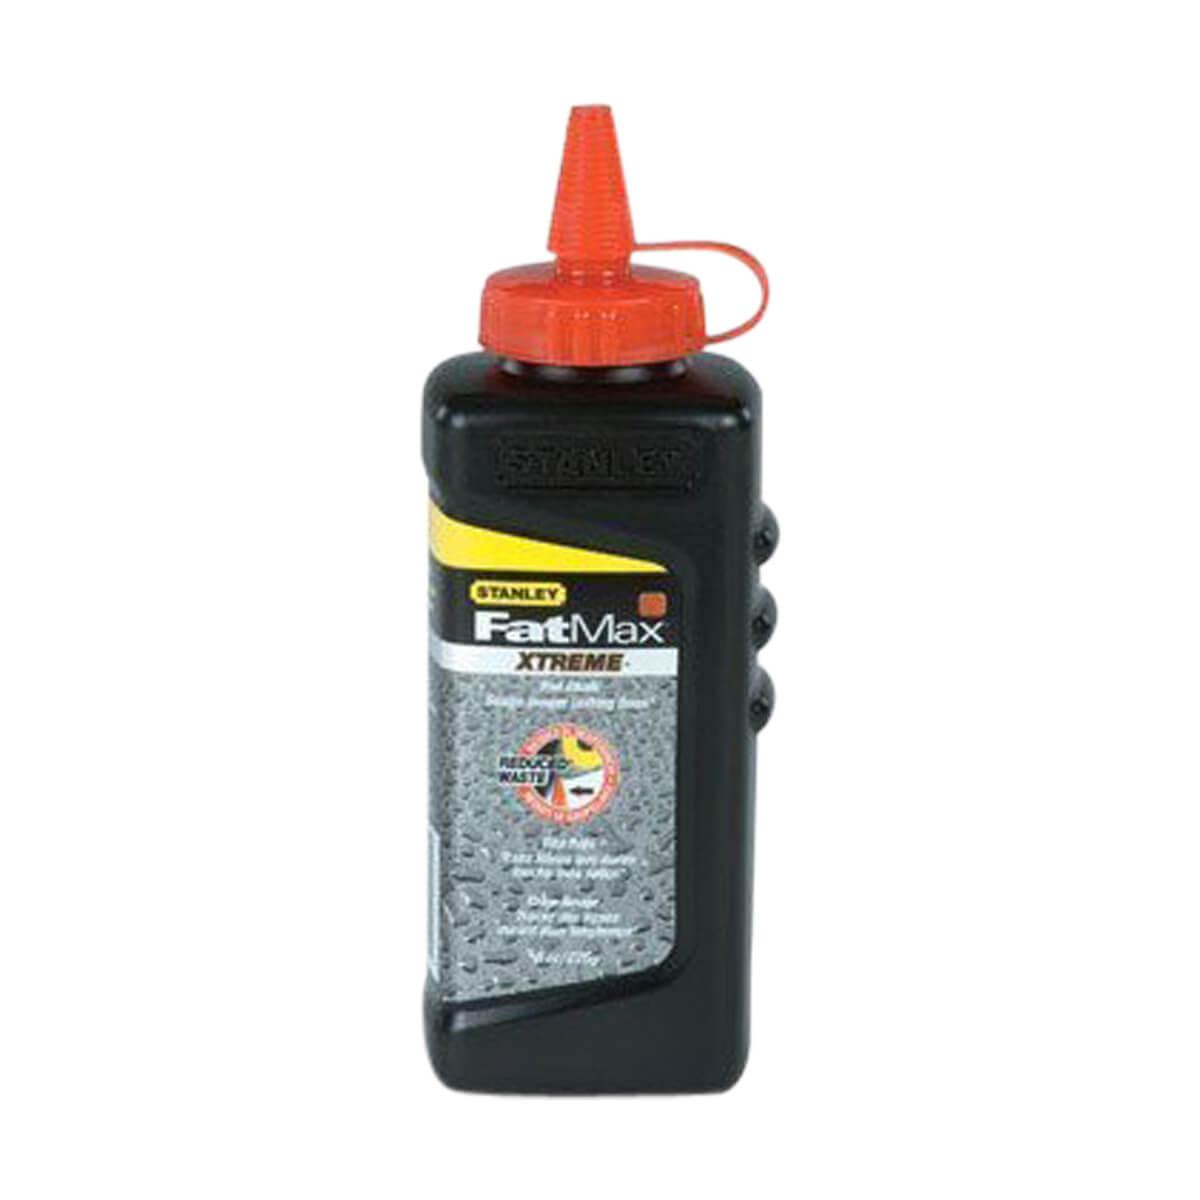 Stanley FatMax Chalk Refill - Red - 8oz